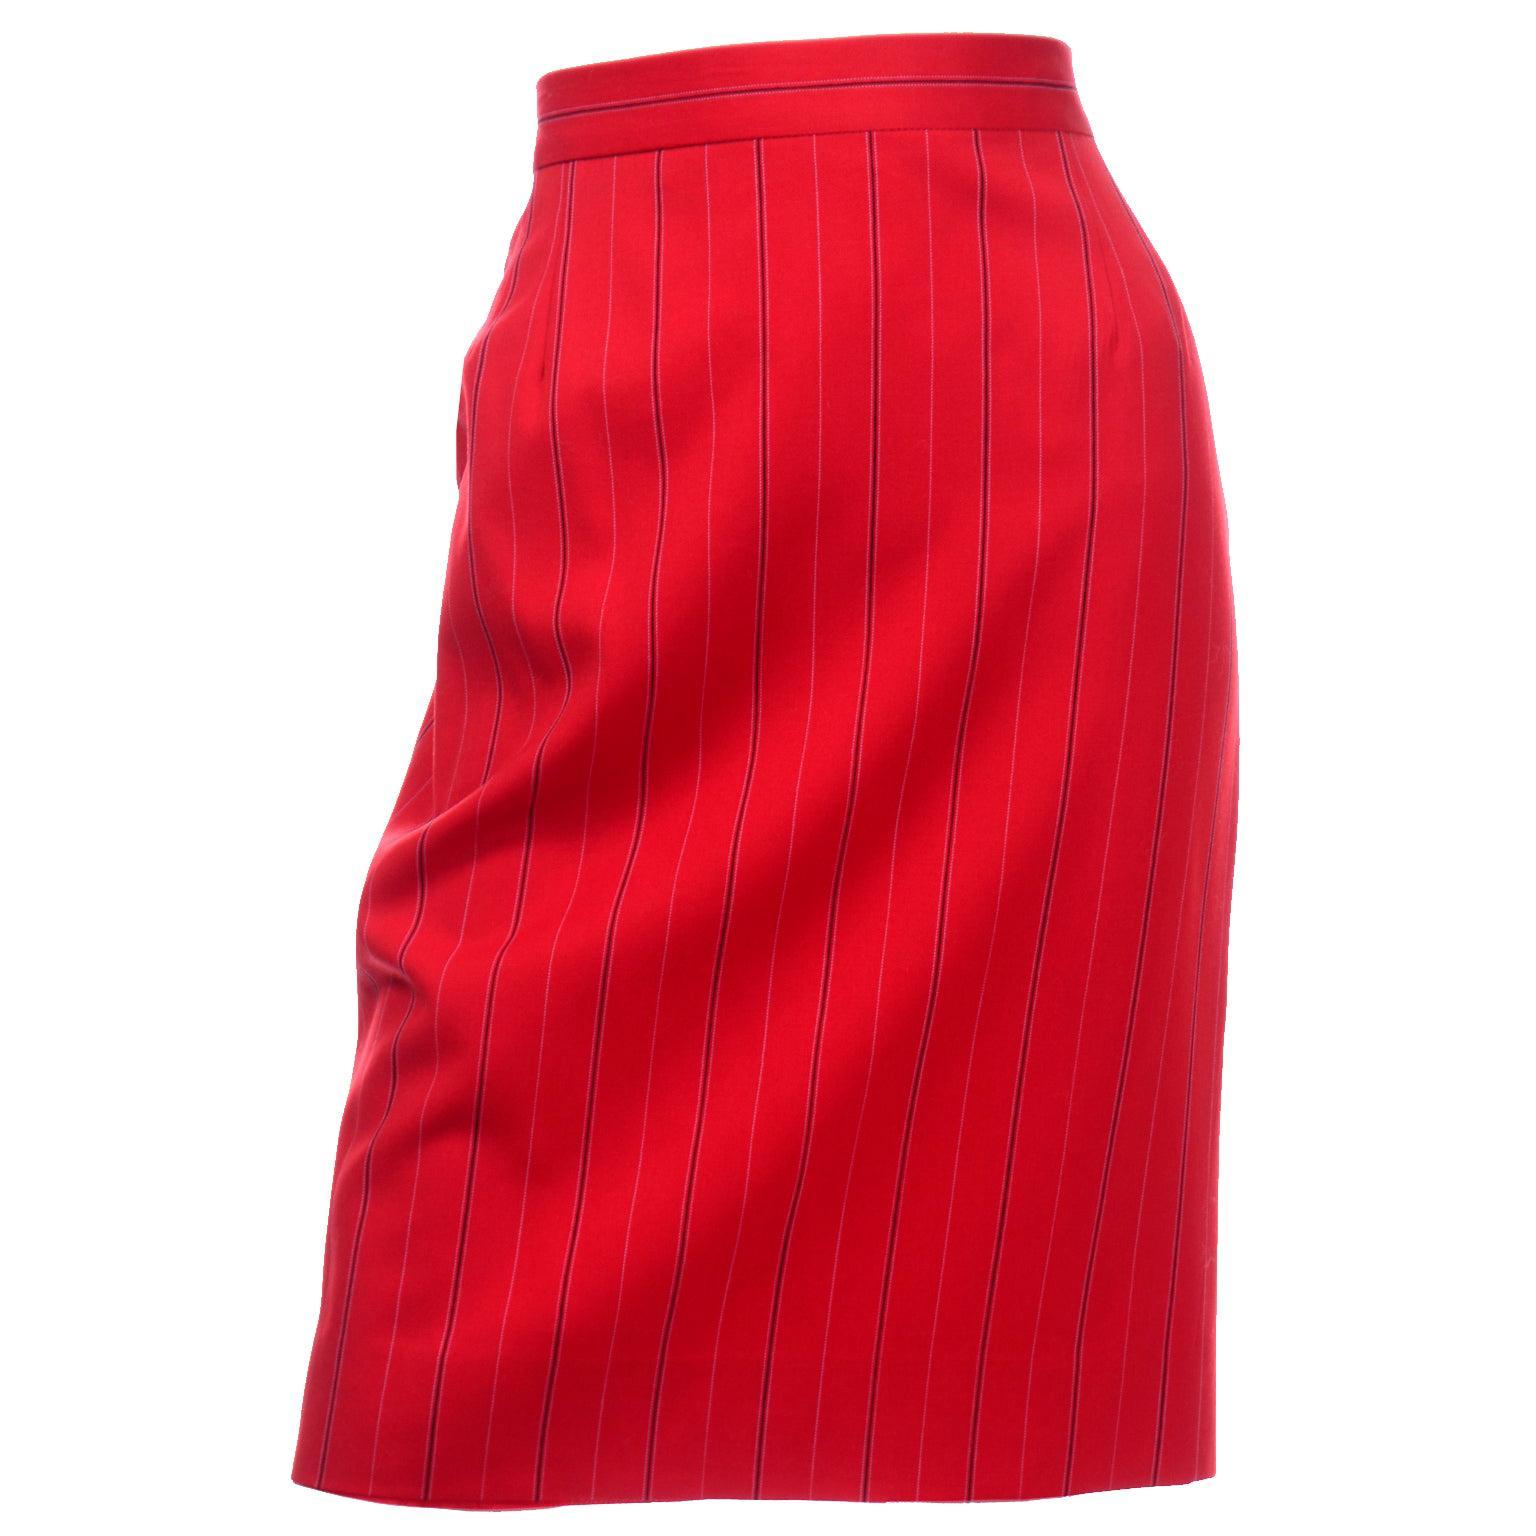 Vintage Escada Margaretha Ley Red Pinstripe Pencil Skirt